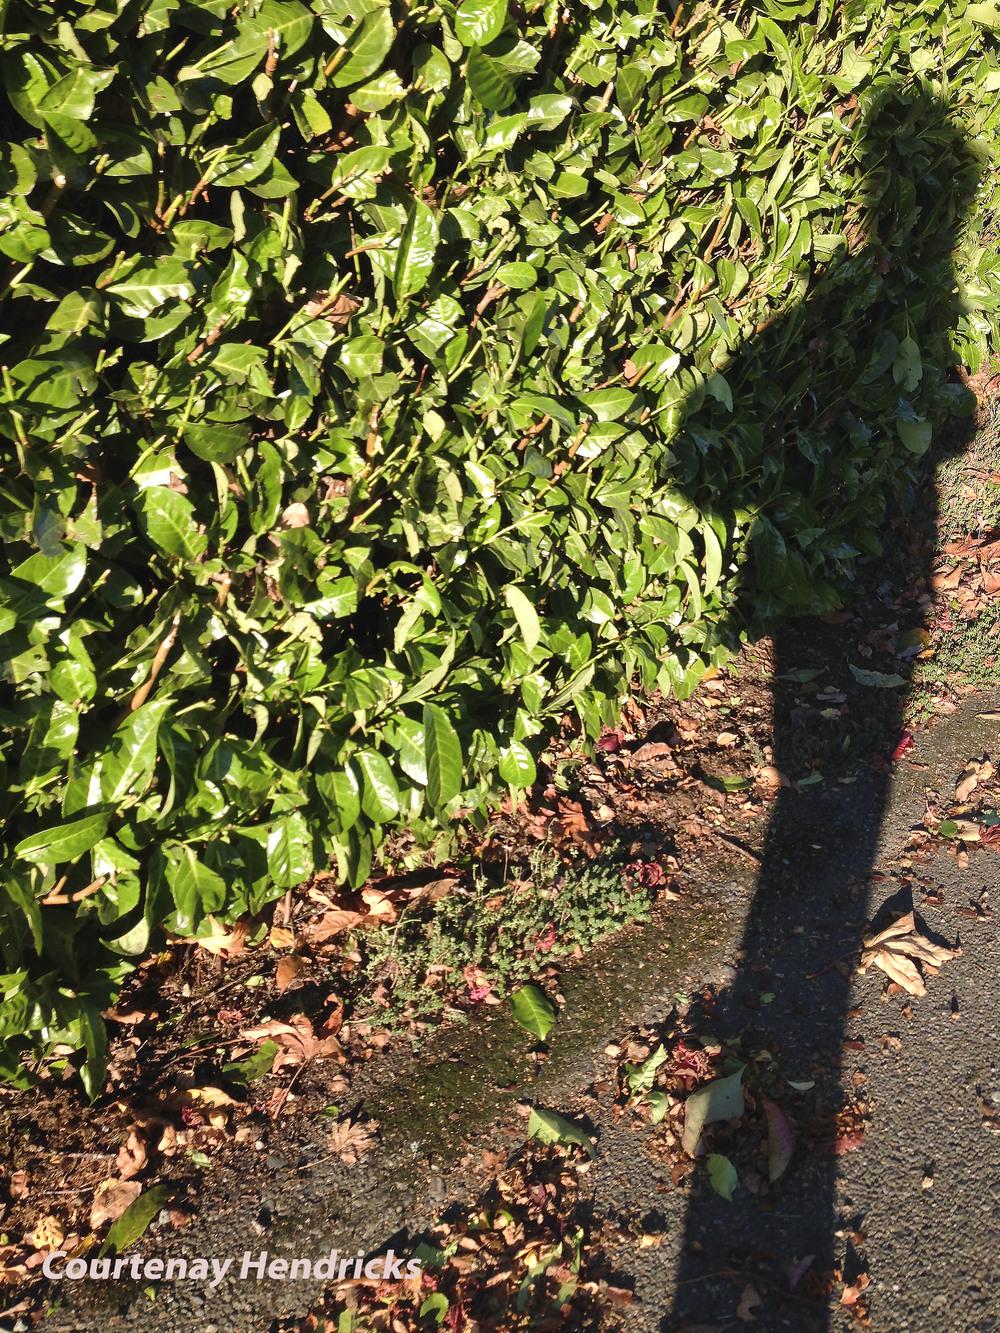 Chendricks_HCPblog_Spring_shadow.jpg